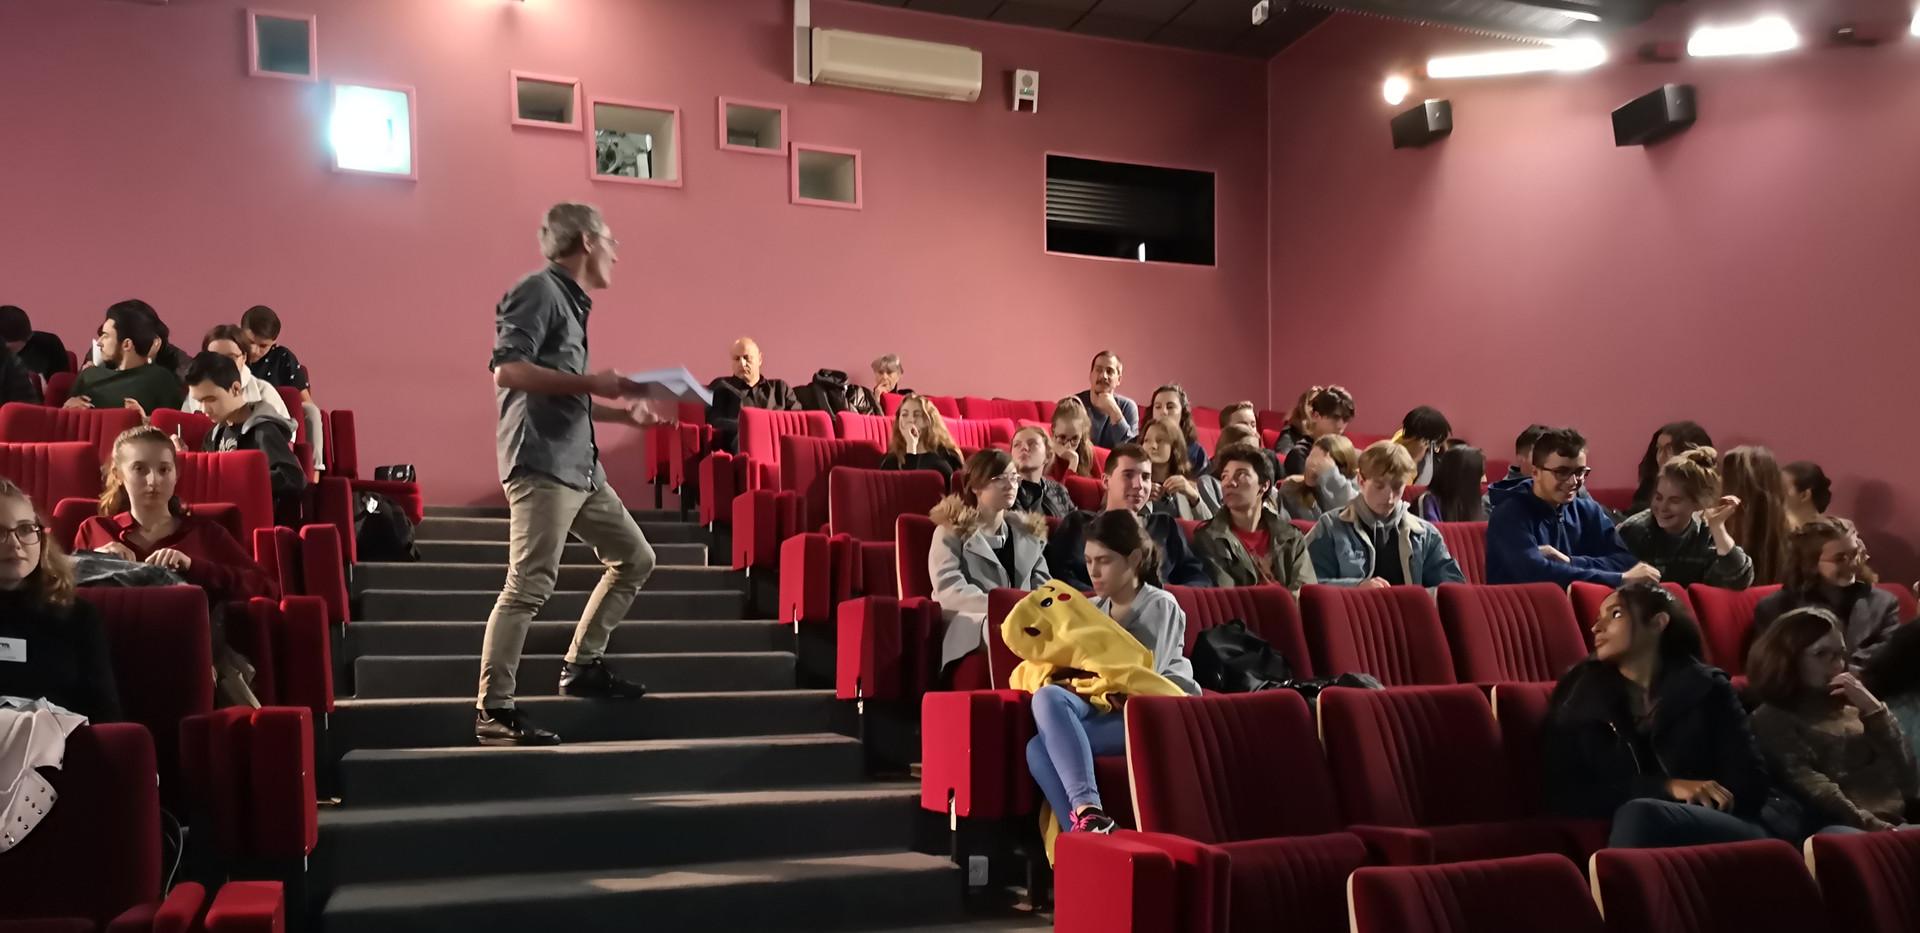 RAN_2018_-_MJC-4_Lycéen.jpg